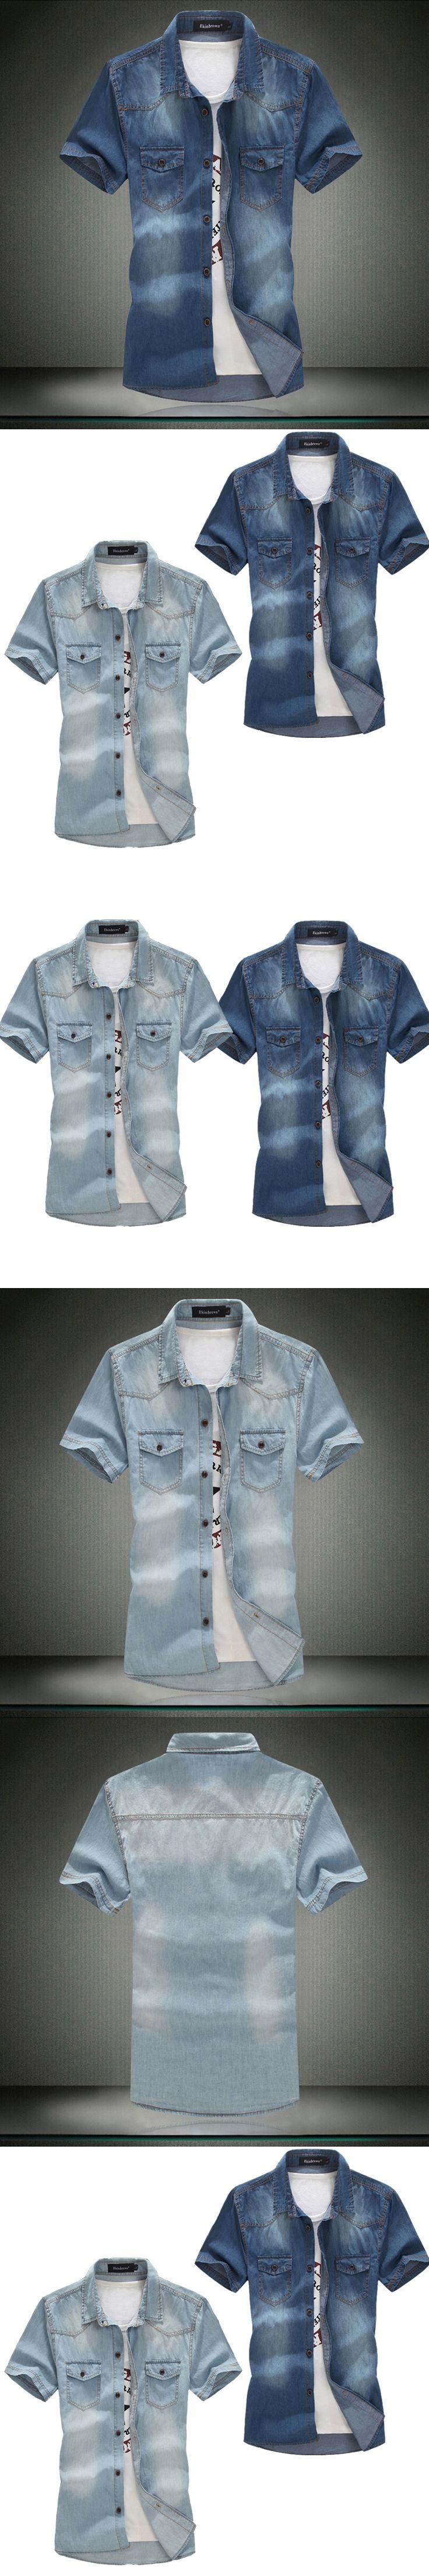 Plus Size!Denim Men 2015 New Men Jeans Shirts Water Washing Male Tops Short Sleeve Flower Solid Denim shirt For Men M-6XL